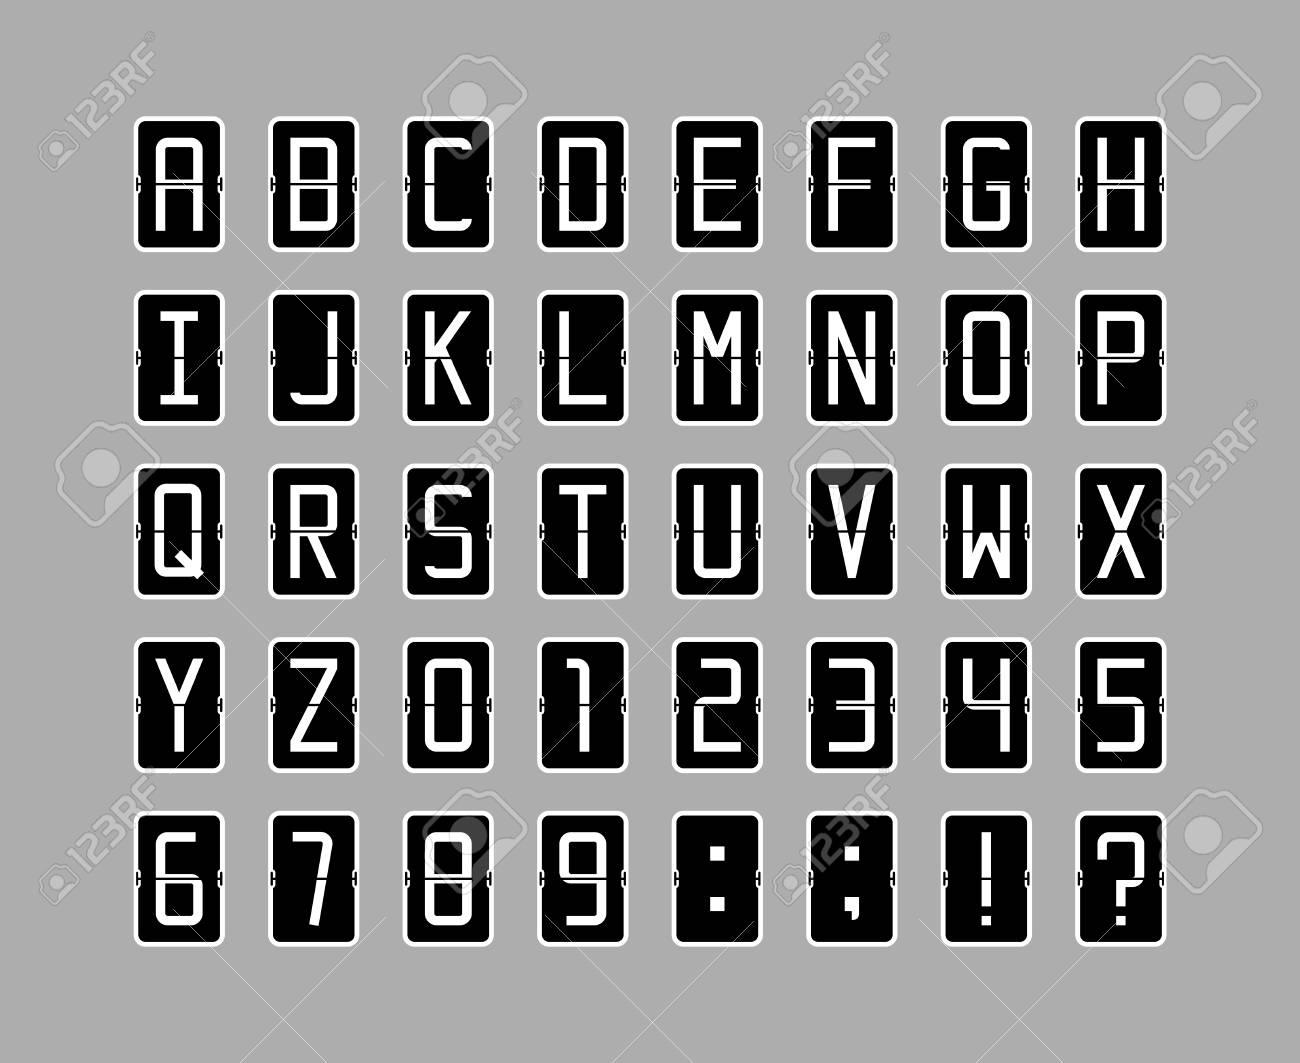 Vector font in black flip clock style